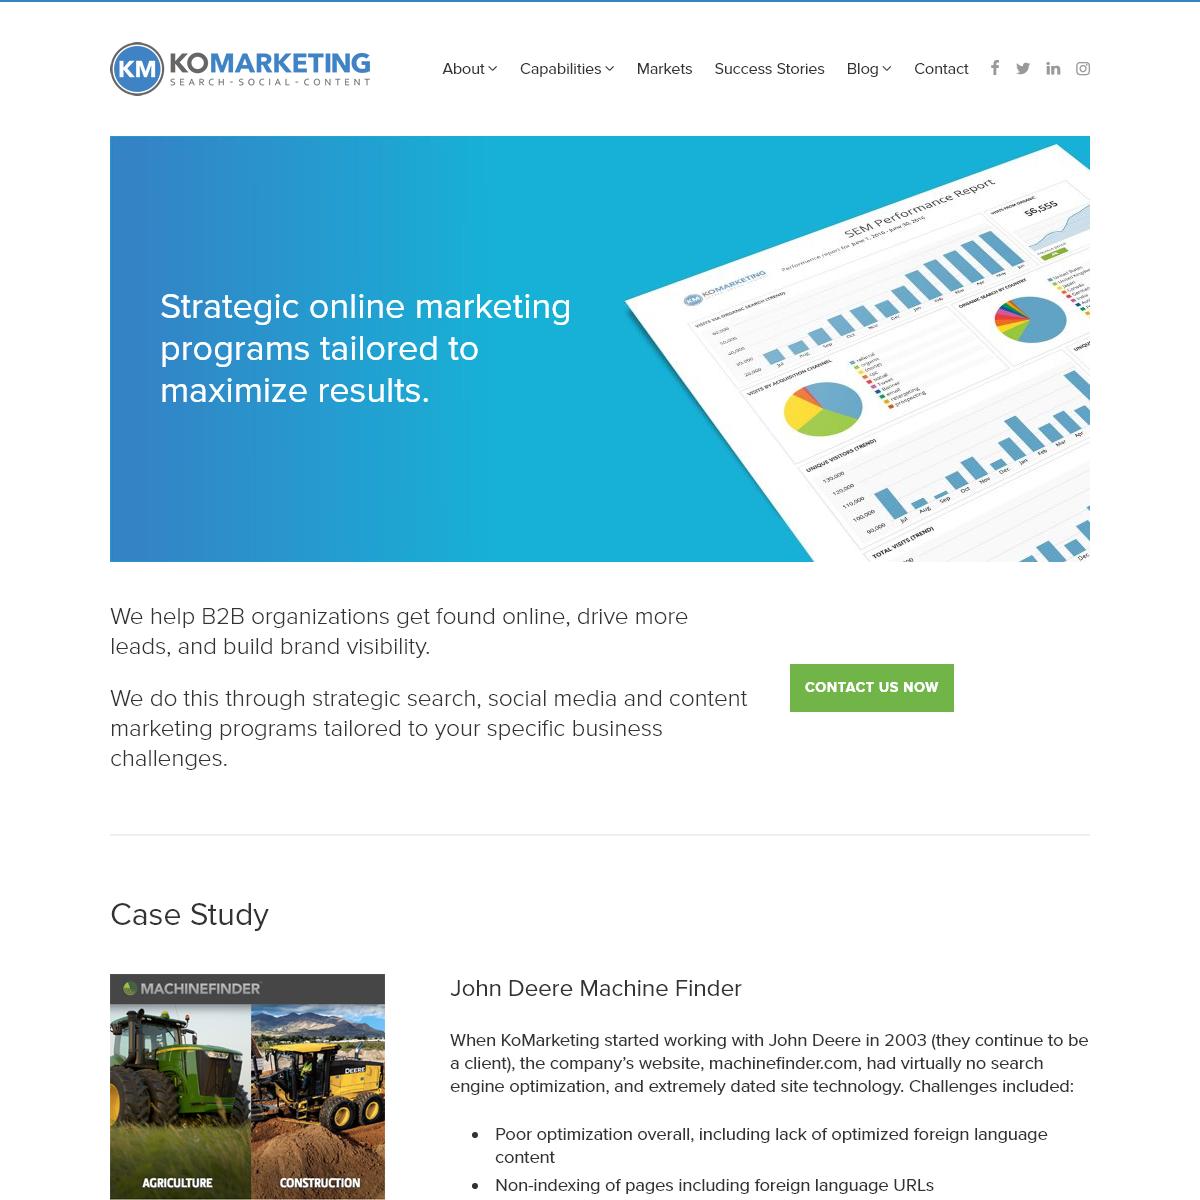 B2B Digital Marketing - Search, Social, Content - KoMarketing